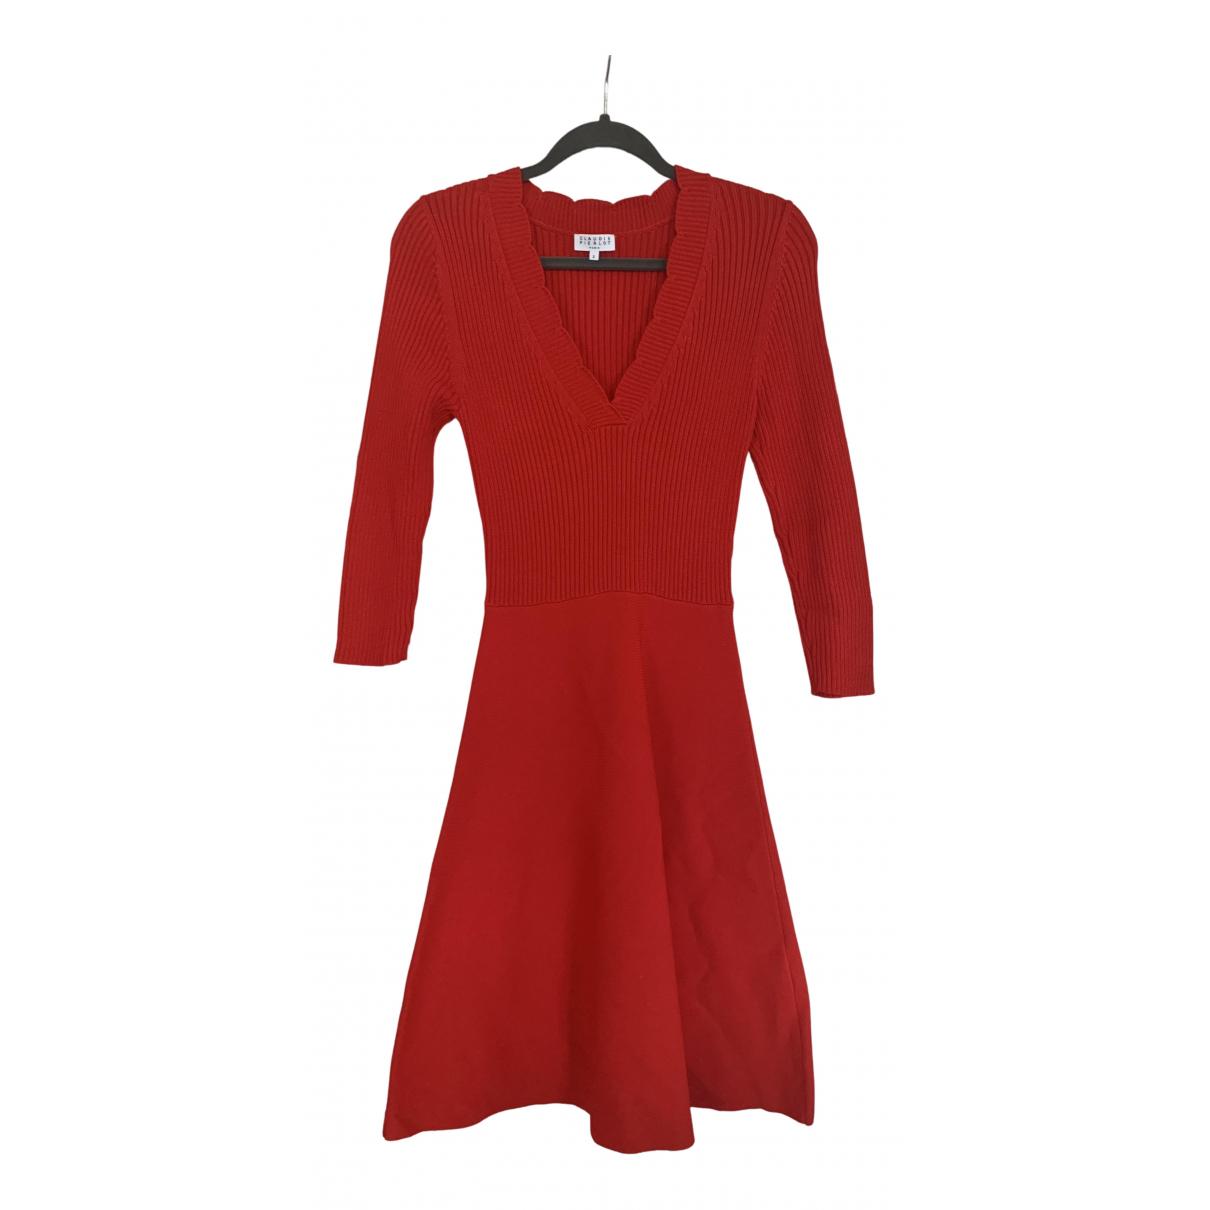 Claudie Pierlot N Red Cotton - elasthane dress for Women 2 0-5